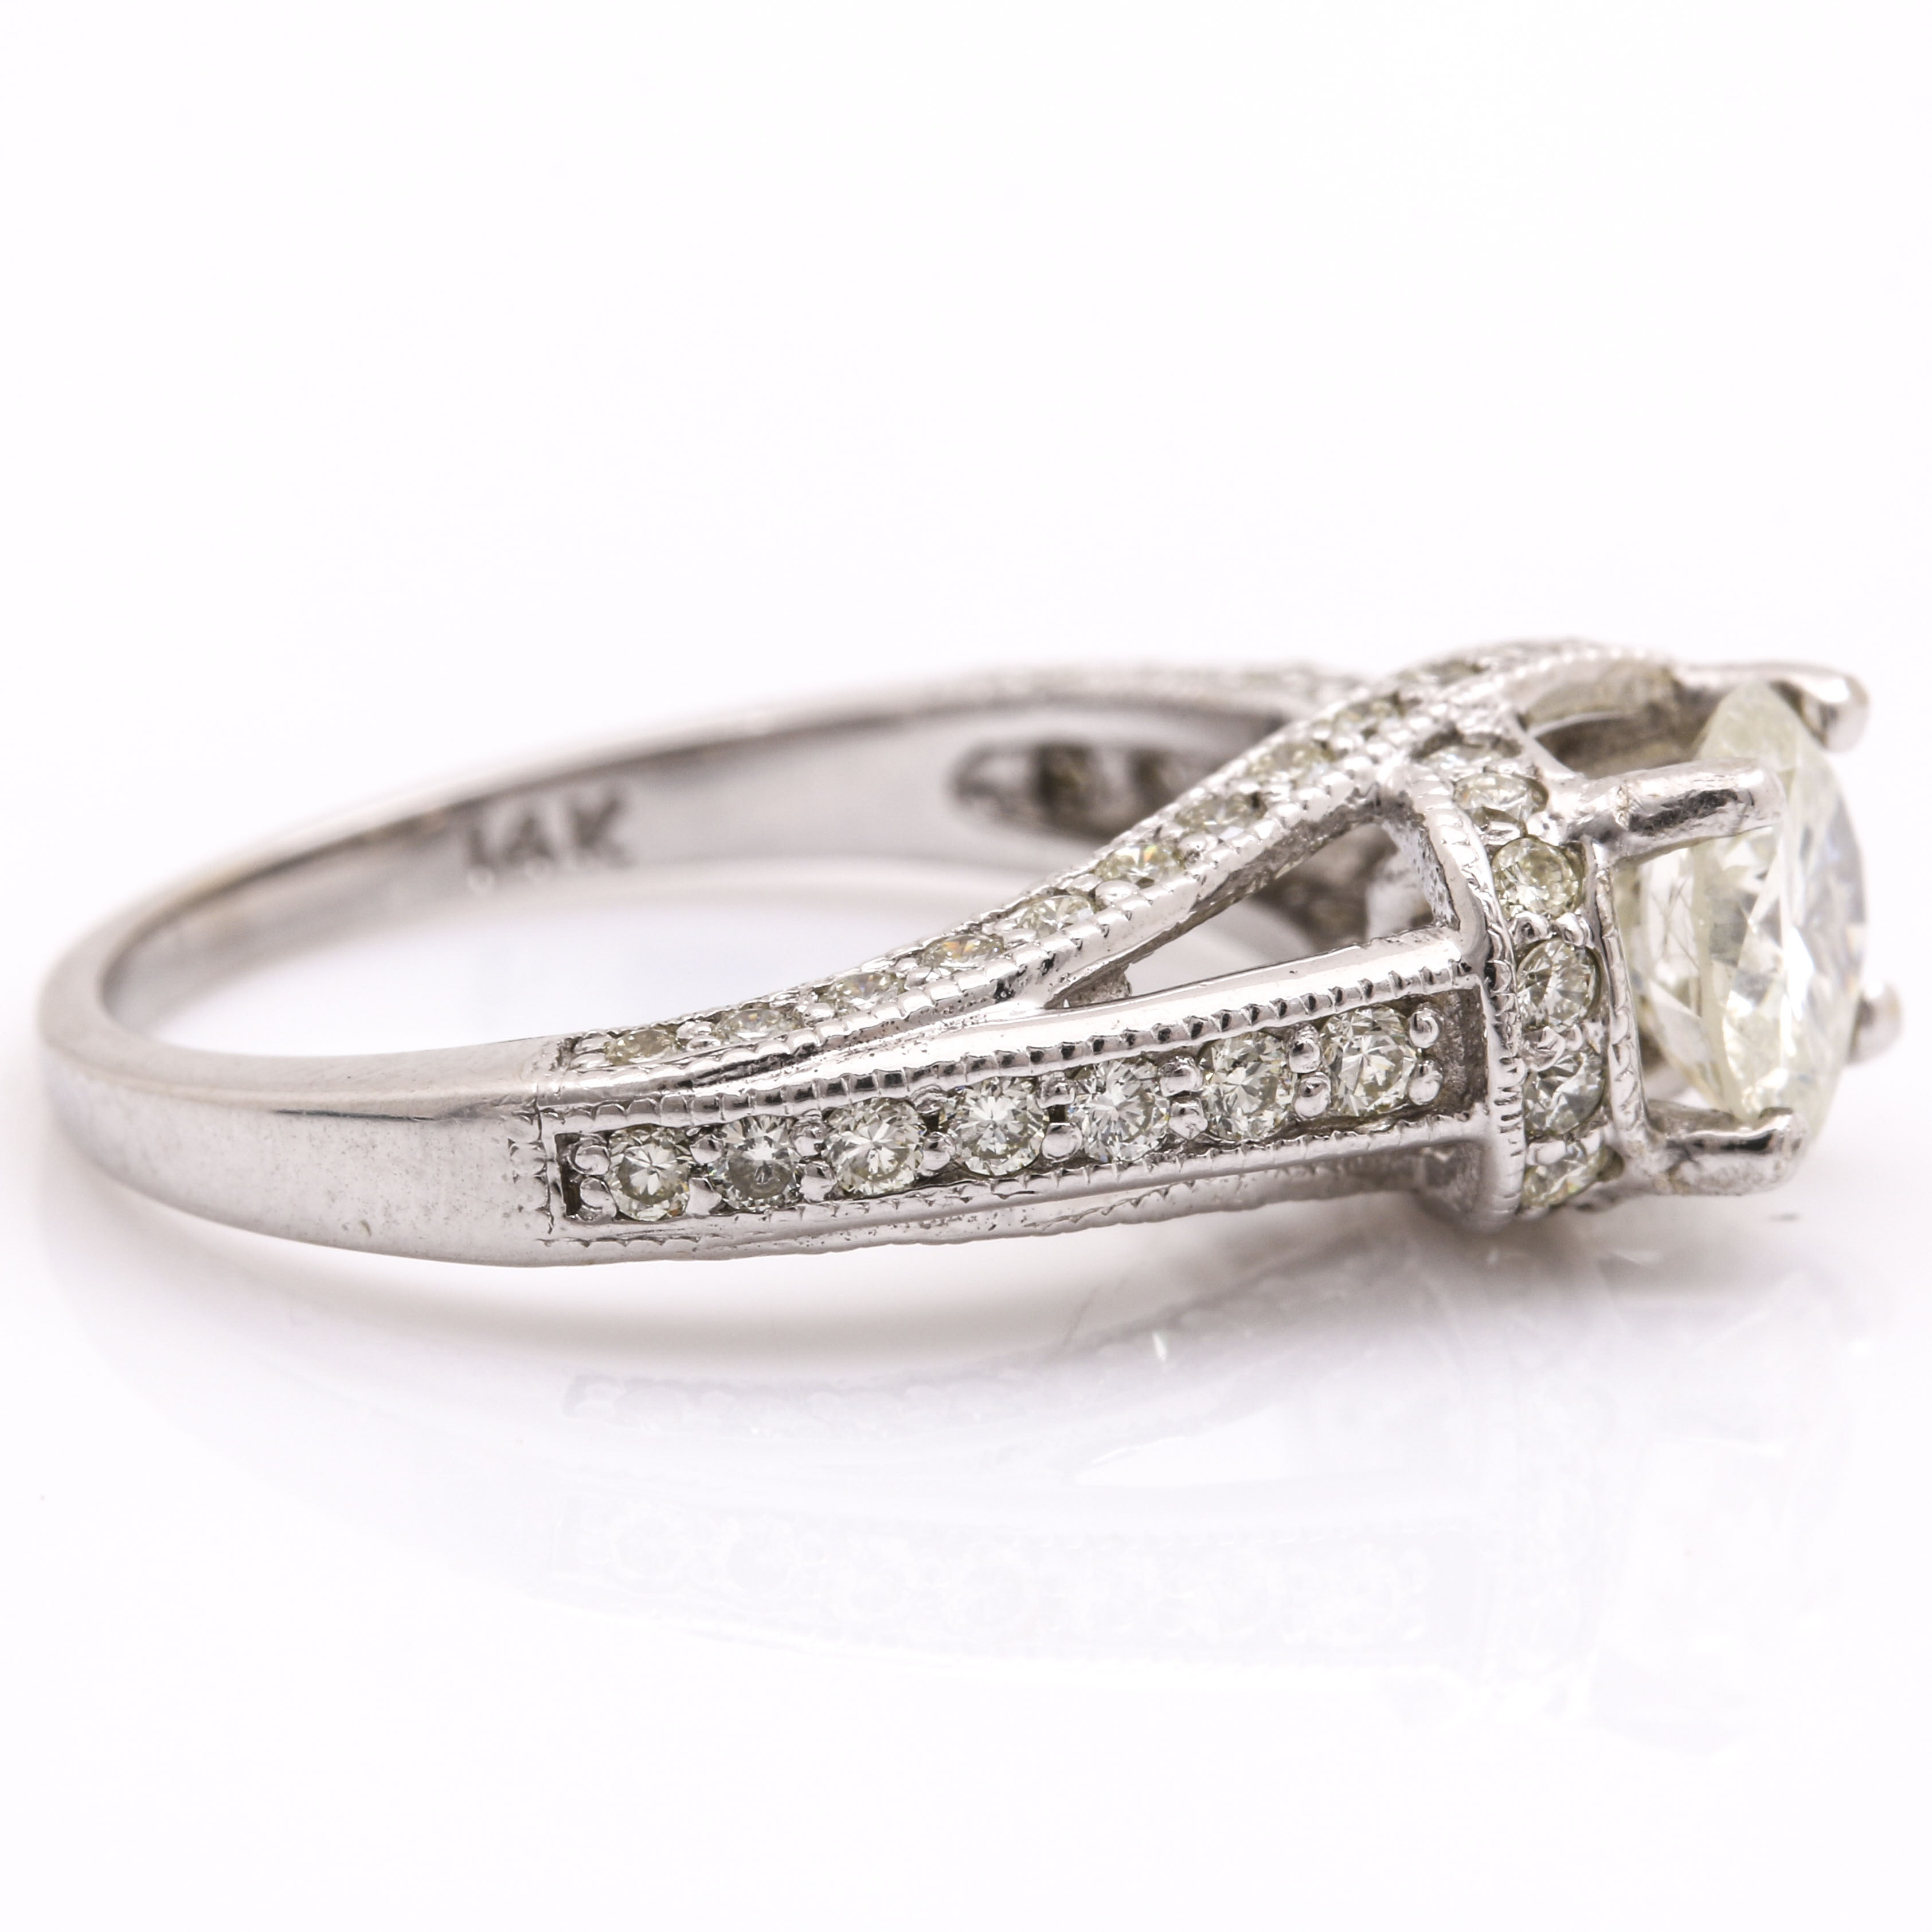 14k White Gold 1 70 Ctw Diamond Encrusted Ring Ebth